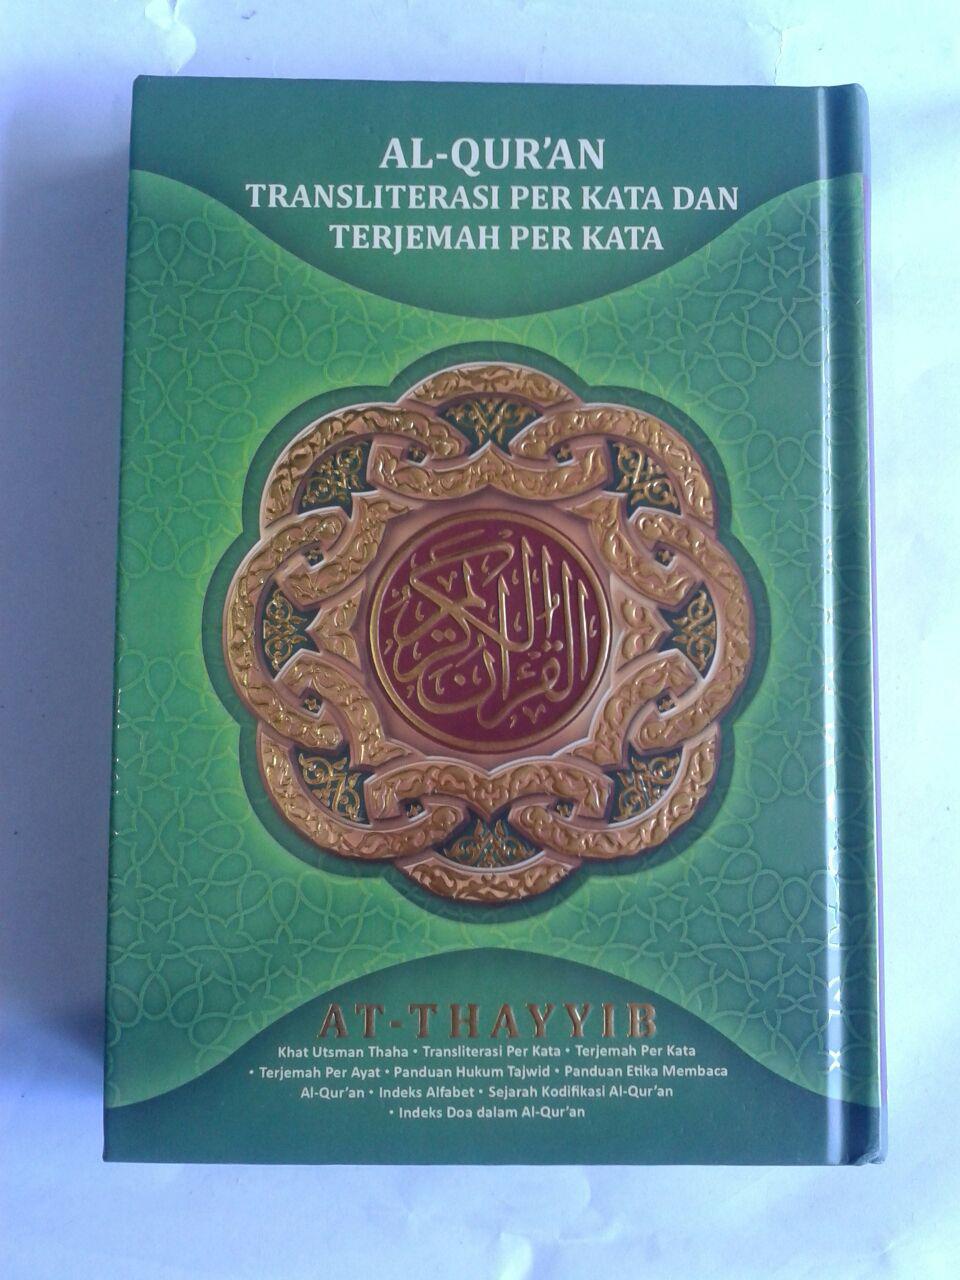 Al-Qur'an Transliterasi Perkata Terjemah Perkata Ath-Thayyib A5 cover 2